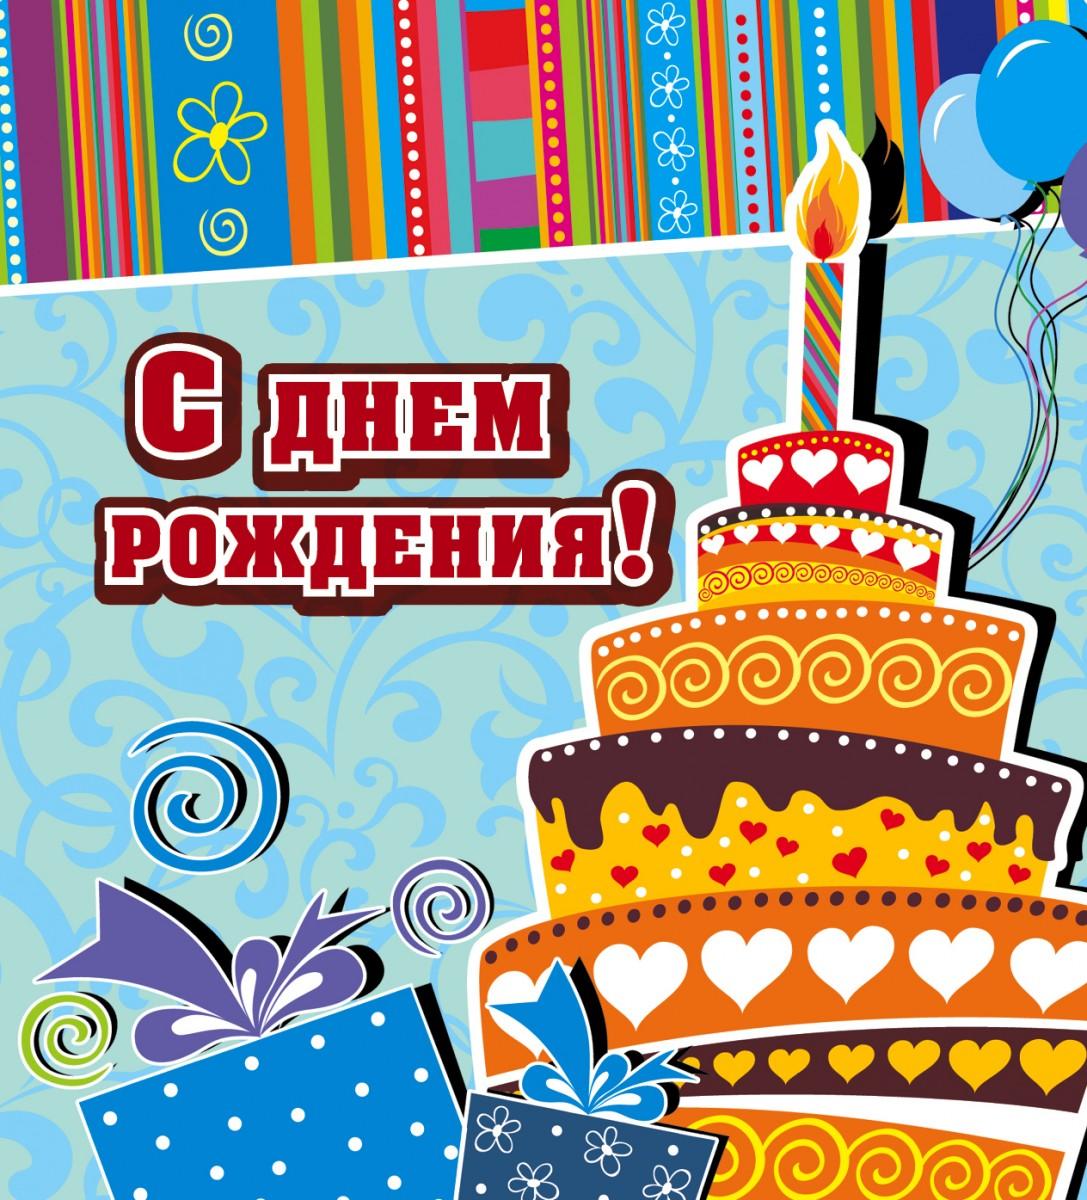 Открытки с днем рождения на рамблере, картинки